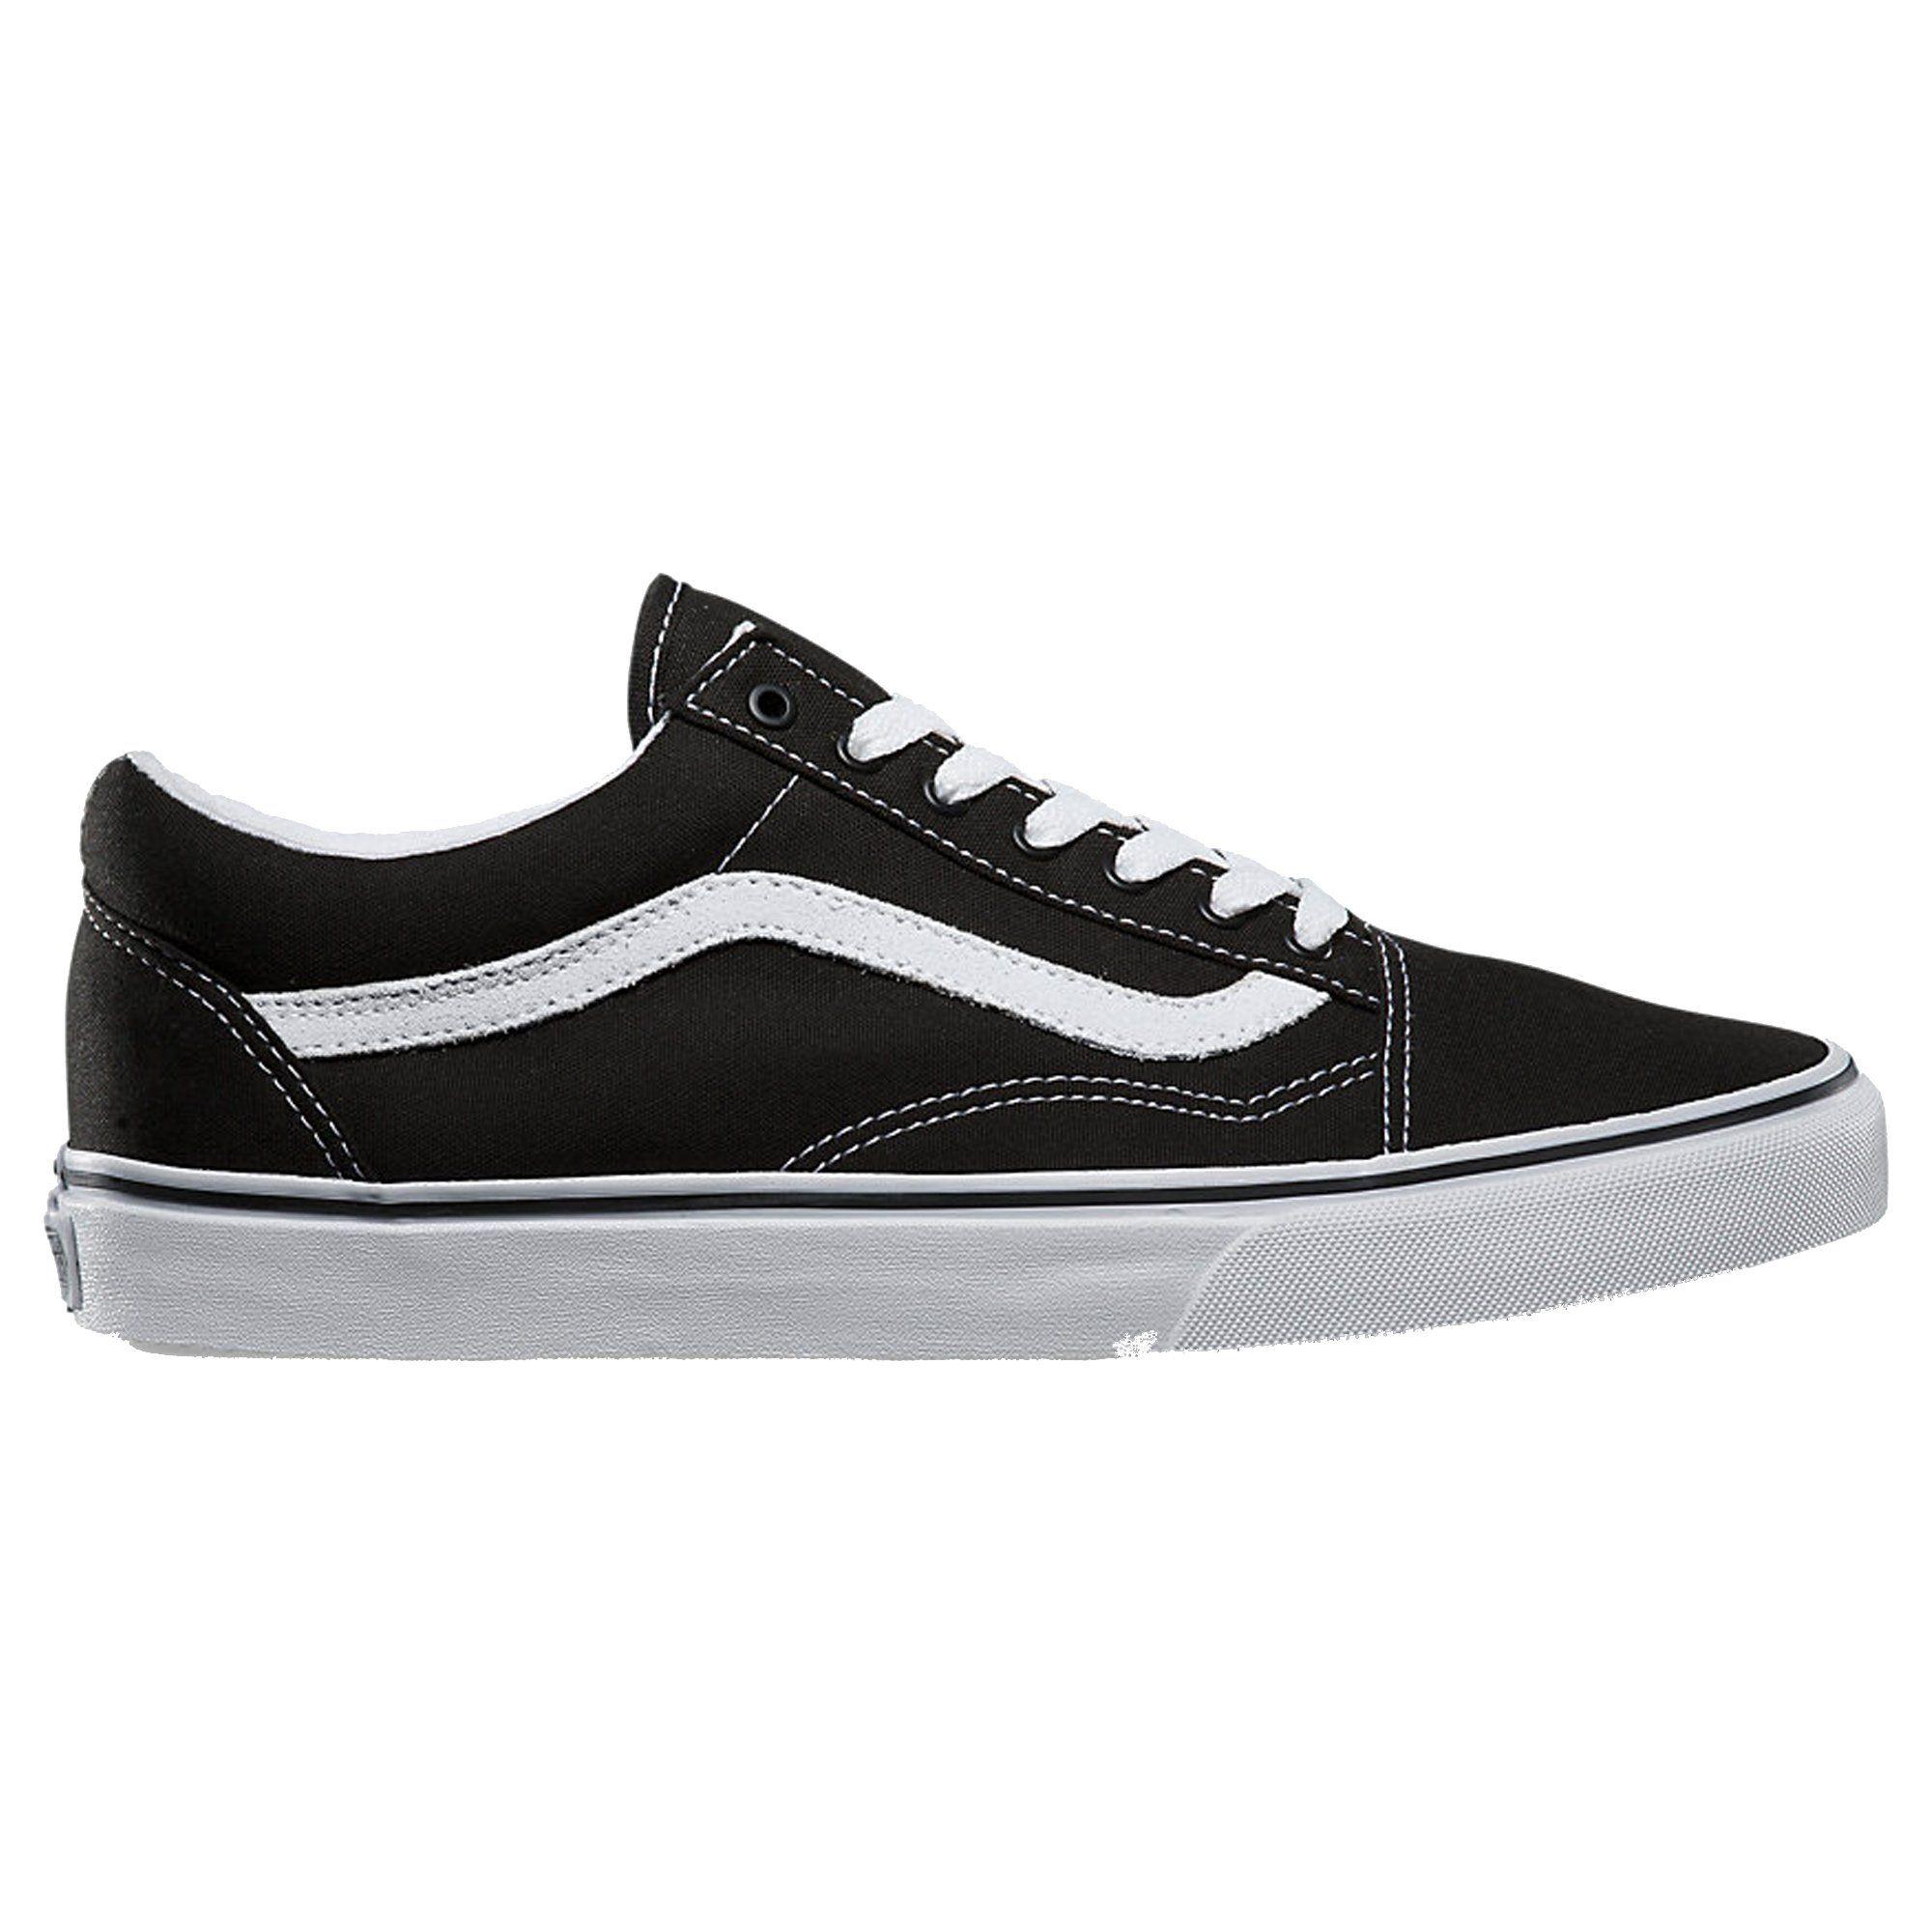 VANS Old Skool Shoe Unisex  a02bba110